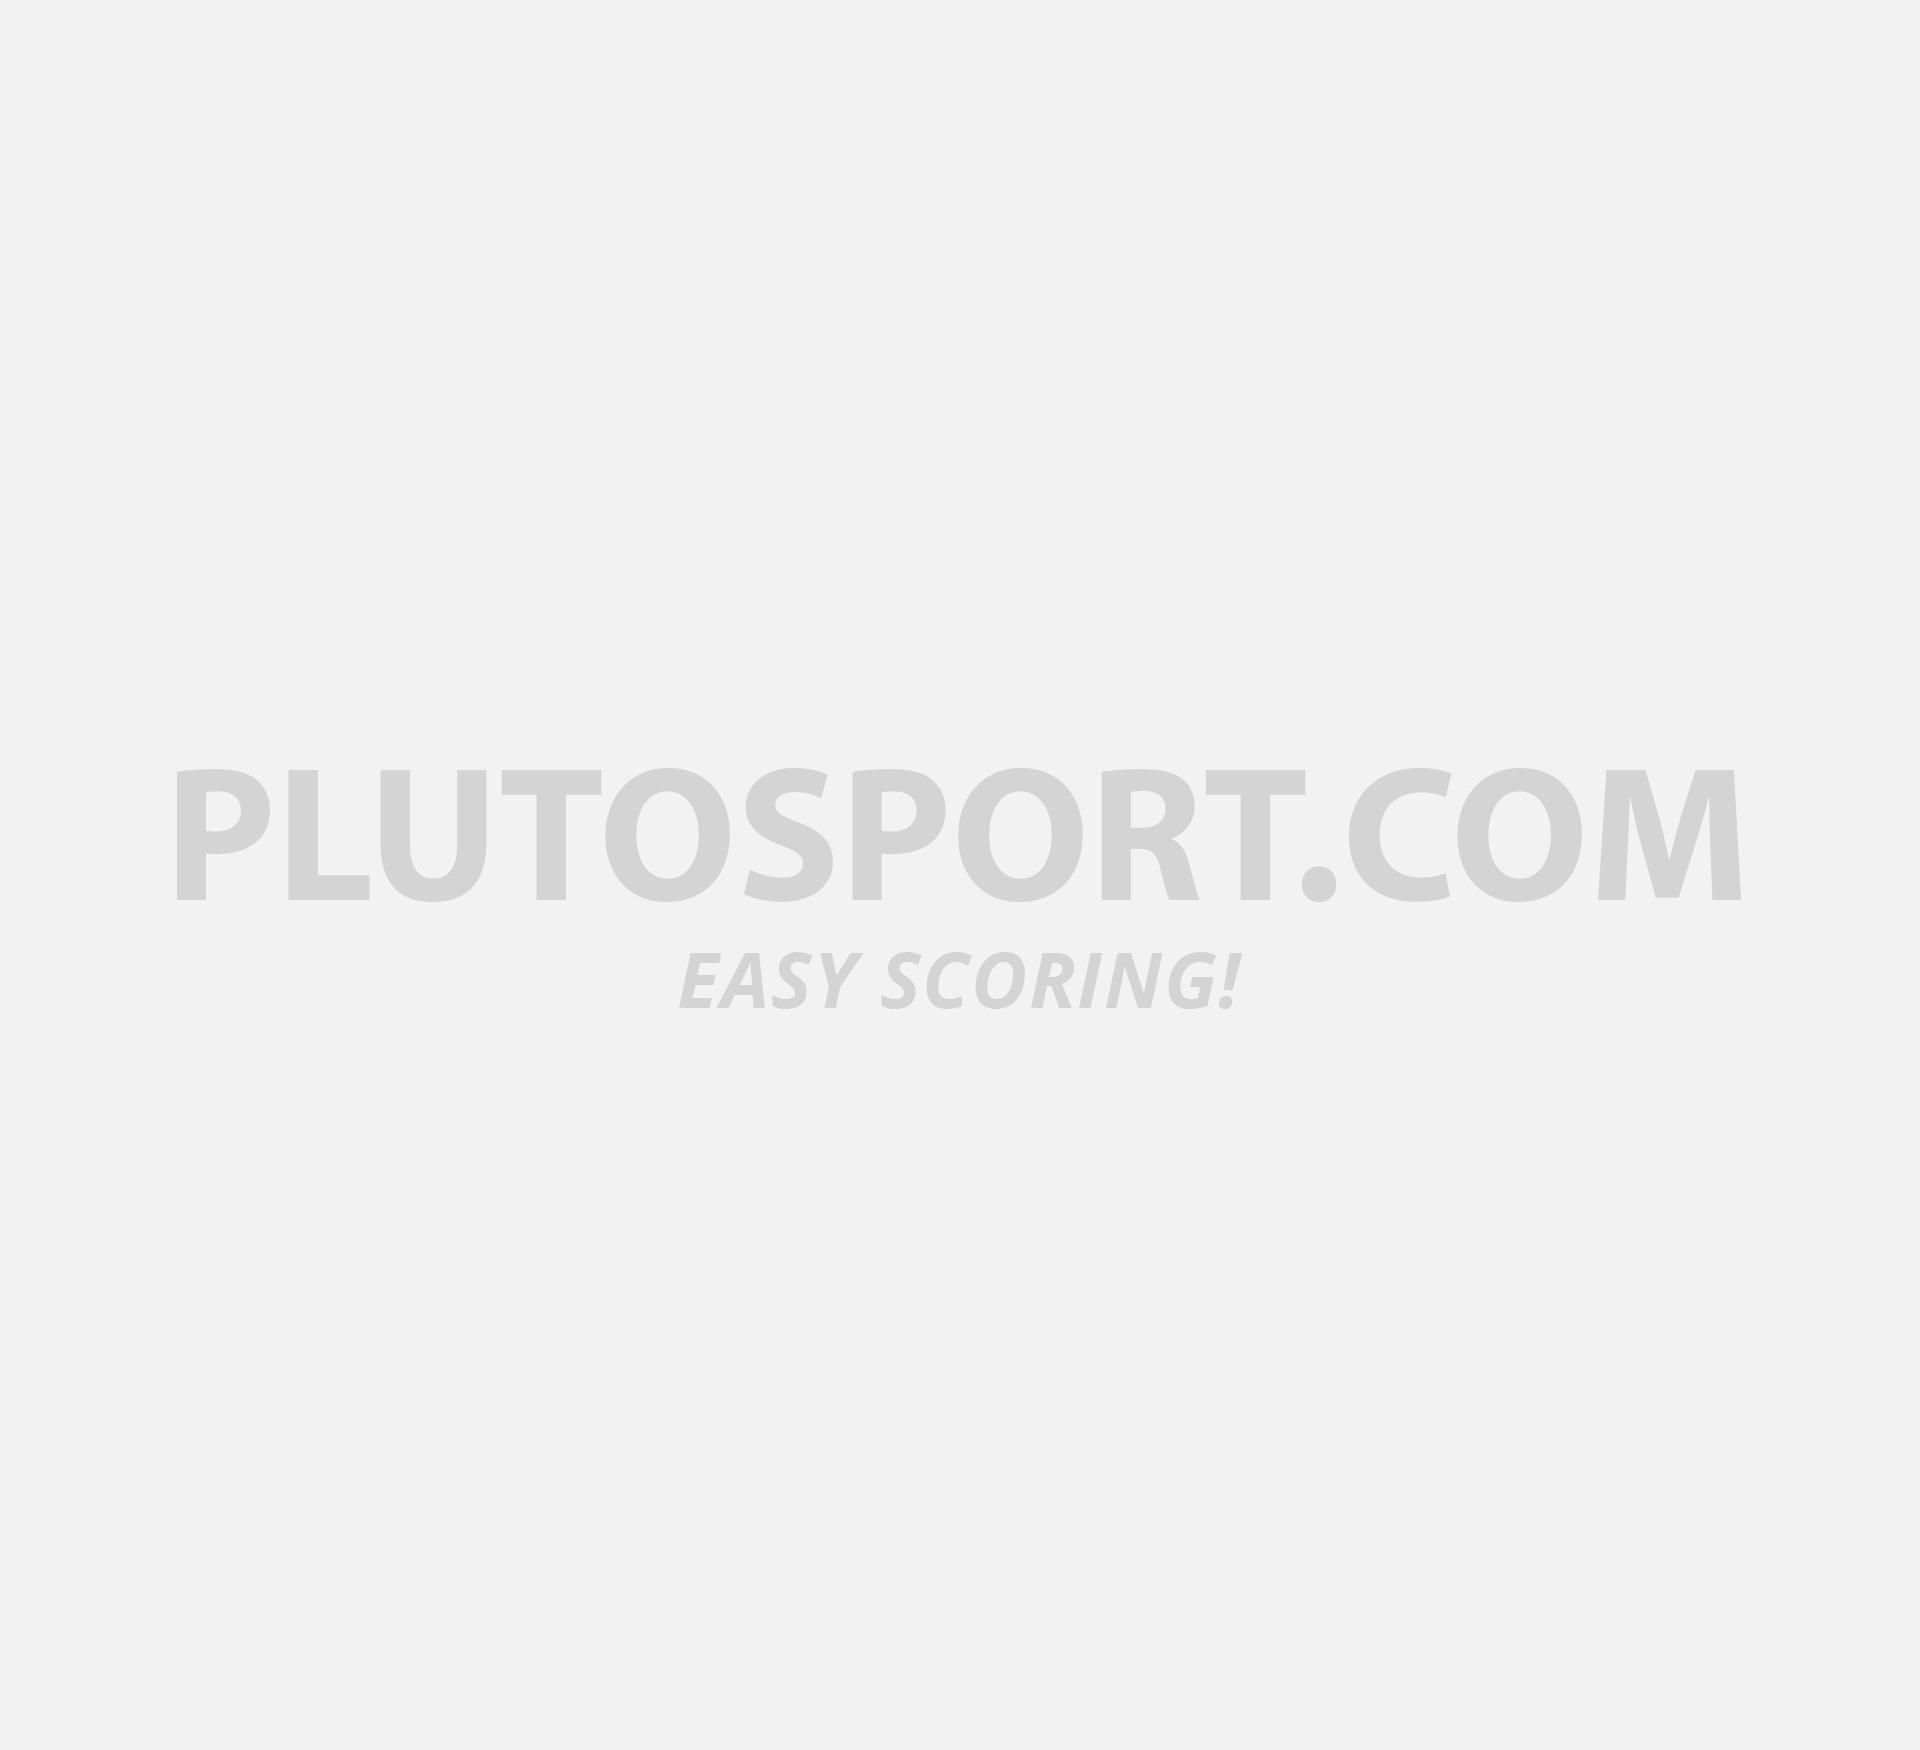 1a070bf44a Roxy Sassy Snowboard Jacket - Winter jackets - Jackets - Clothing -  Lifestyle - Sports | Plutosport